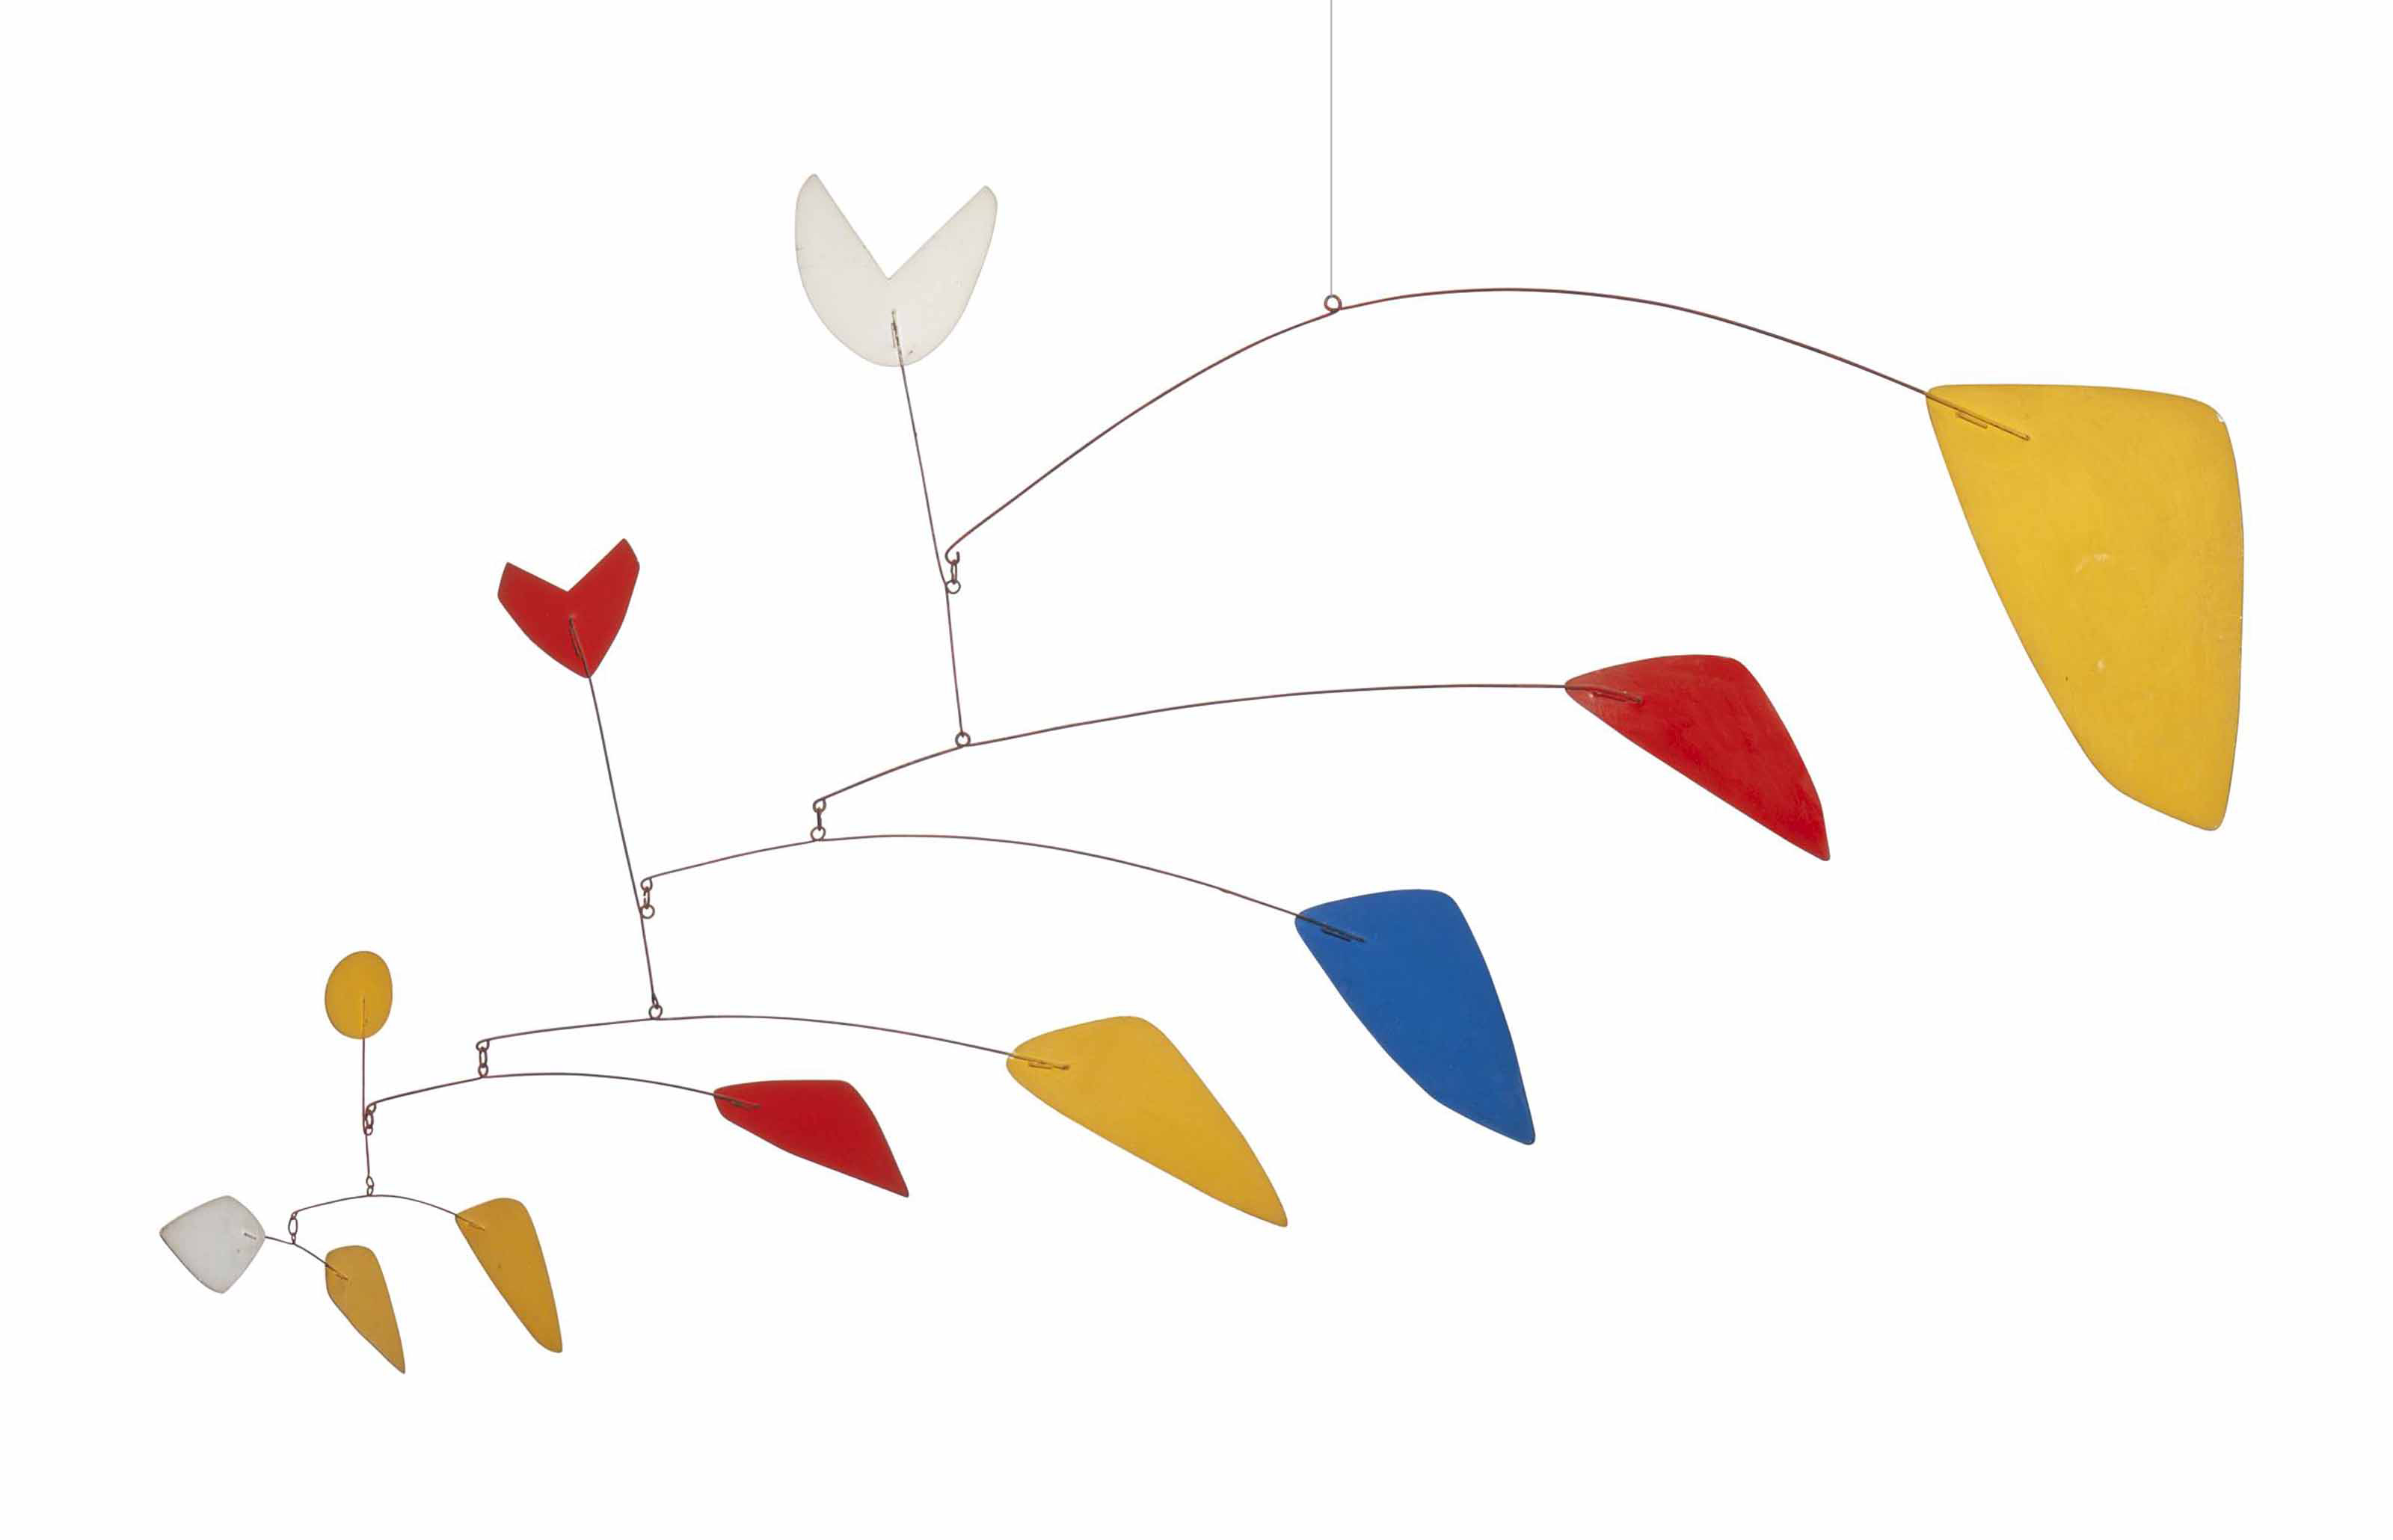 Alexander calder clipart vector download Alexander Calder (1898-1976)   Untitled   1960s, Sculptures, Statues ... vector download